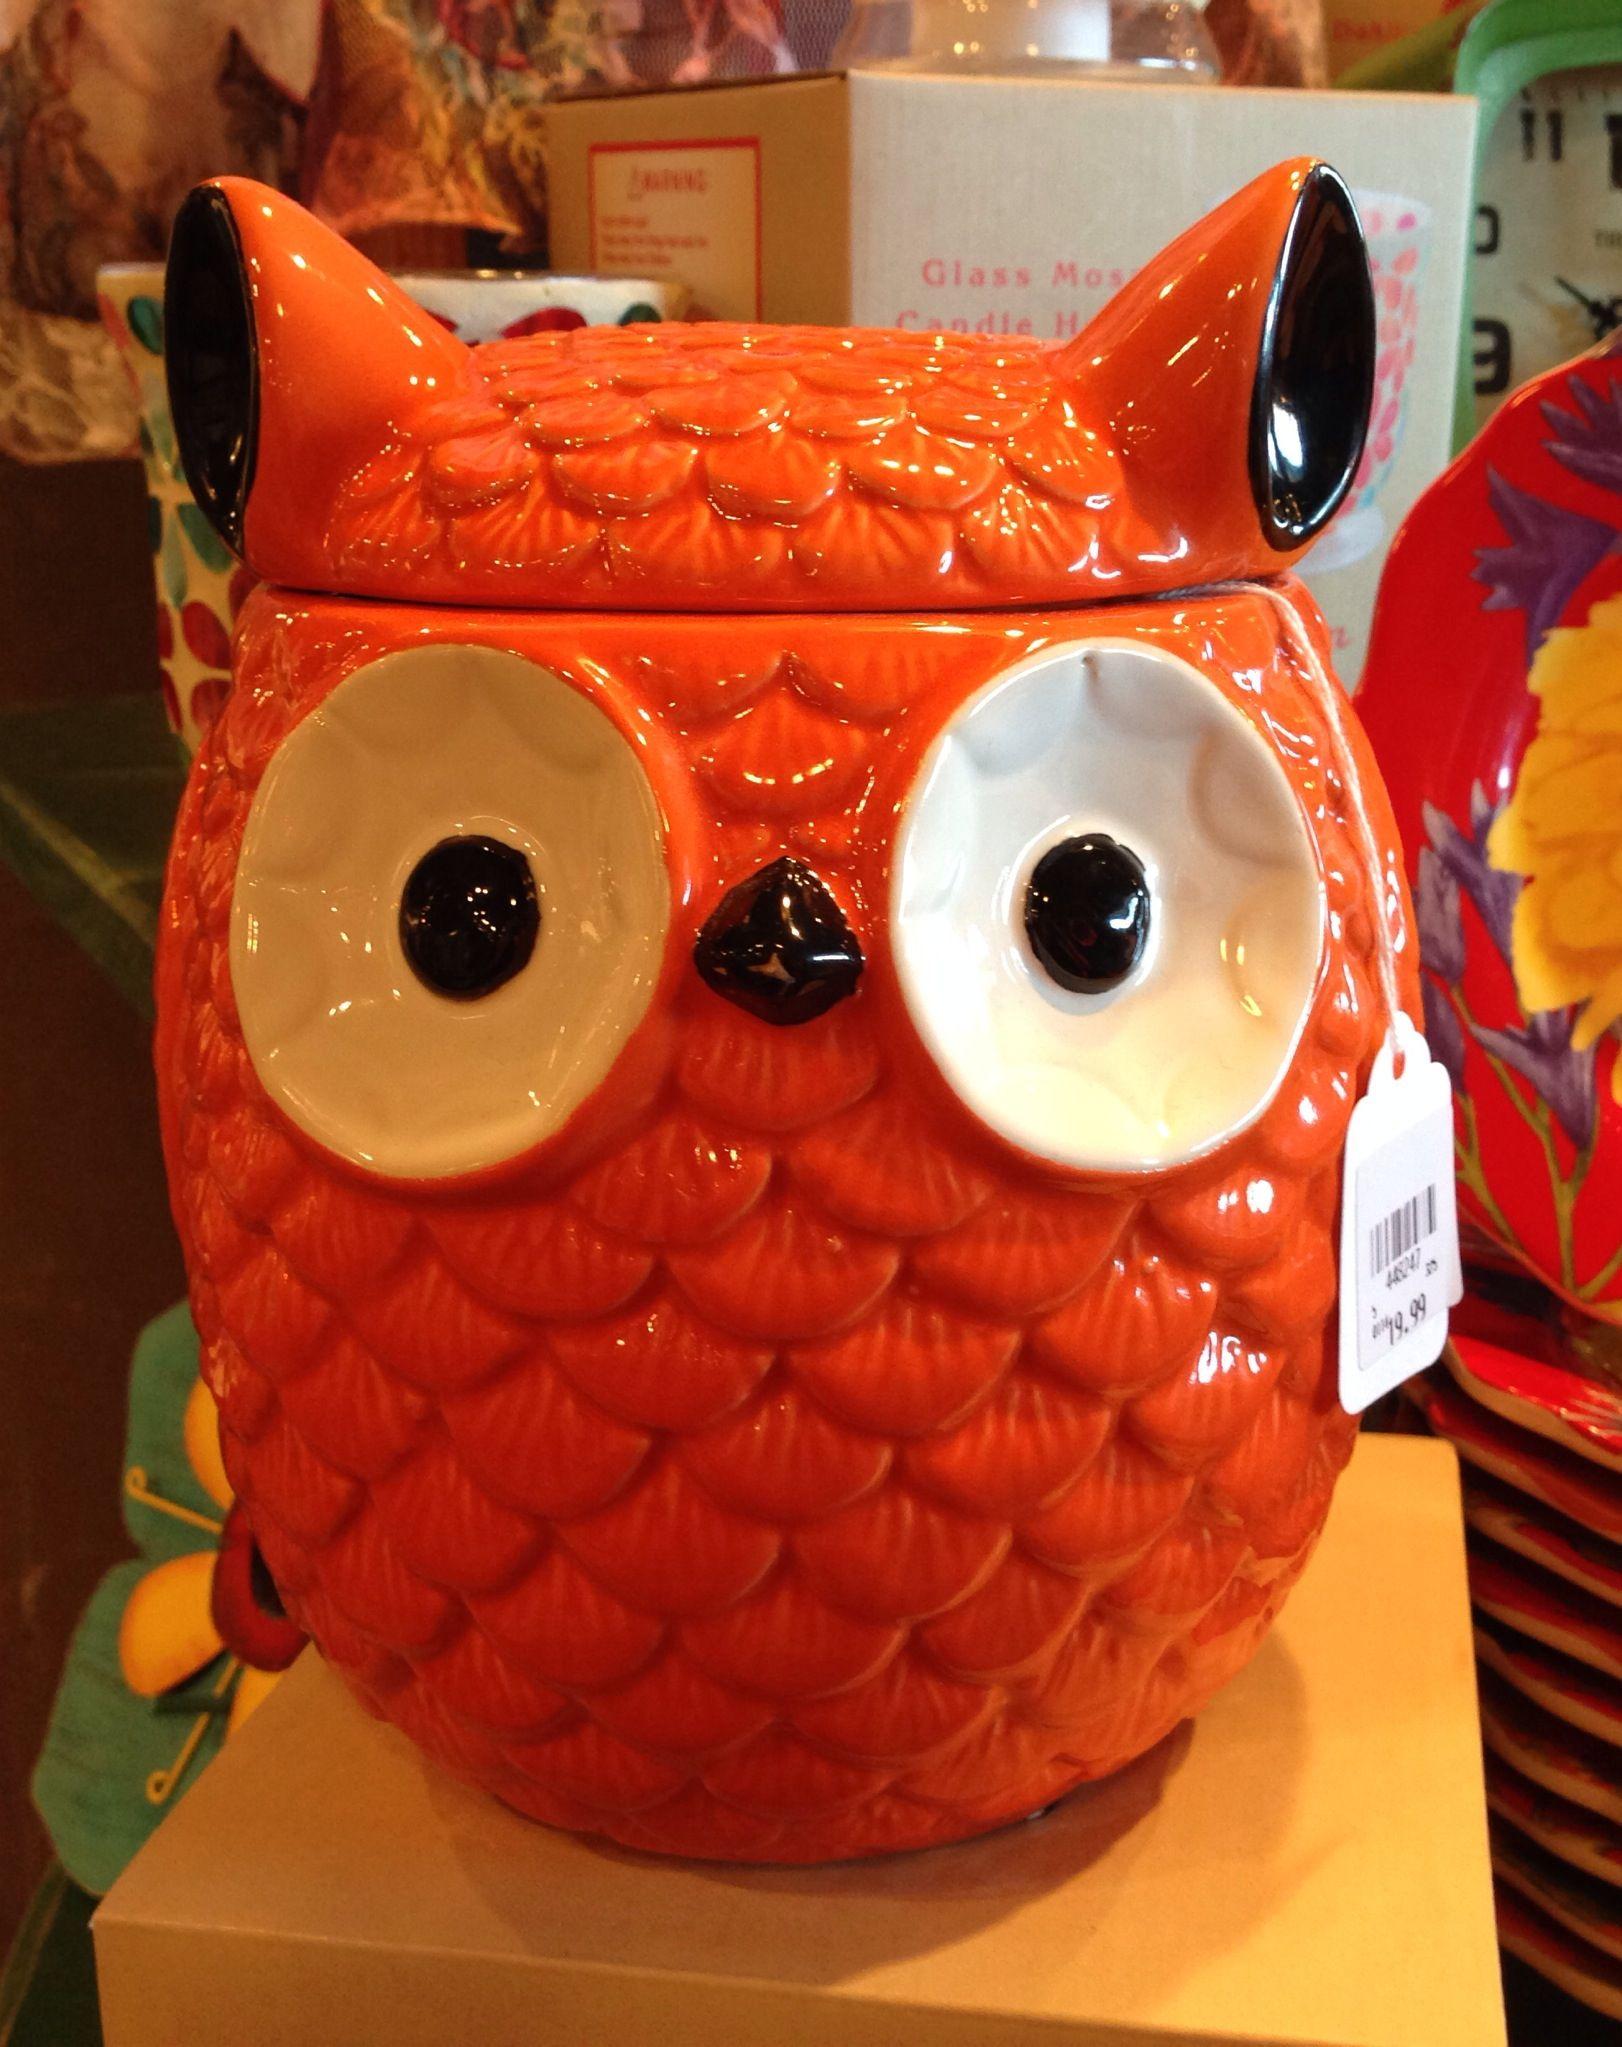 Owl Cookie Jar Orange Er Barrel Found Him At Breakfast A Few Weeks Ago